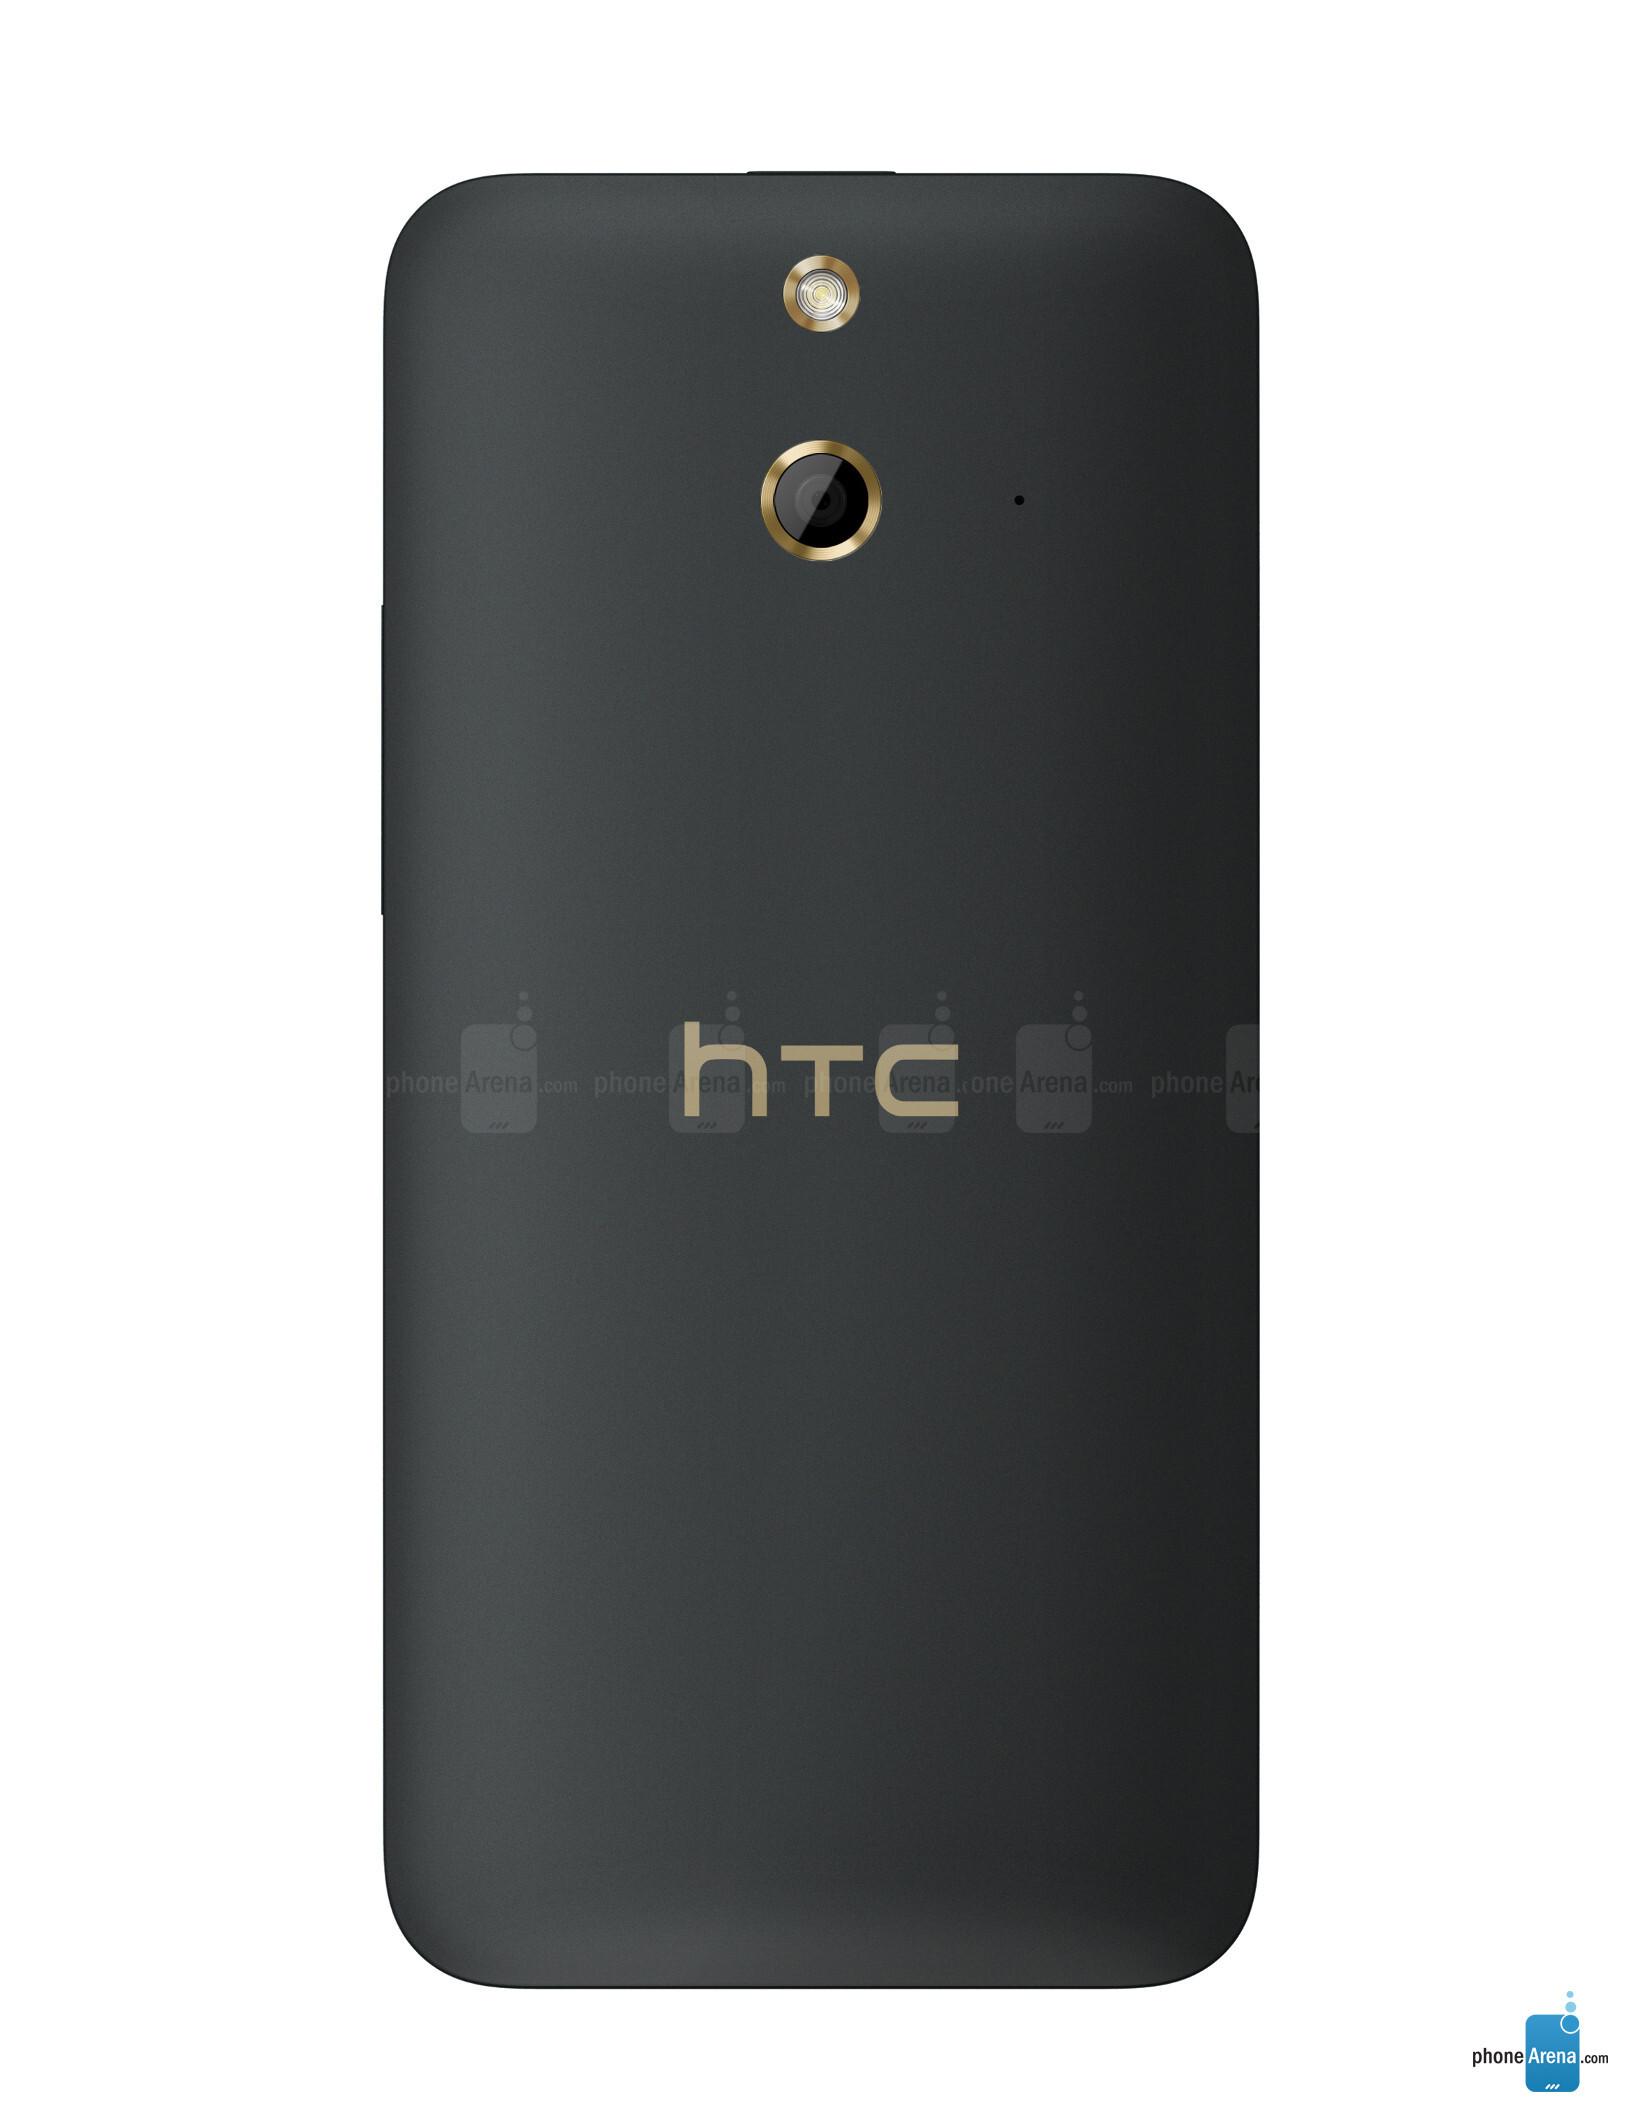 HTC One (E8) specs